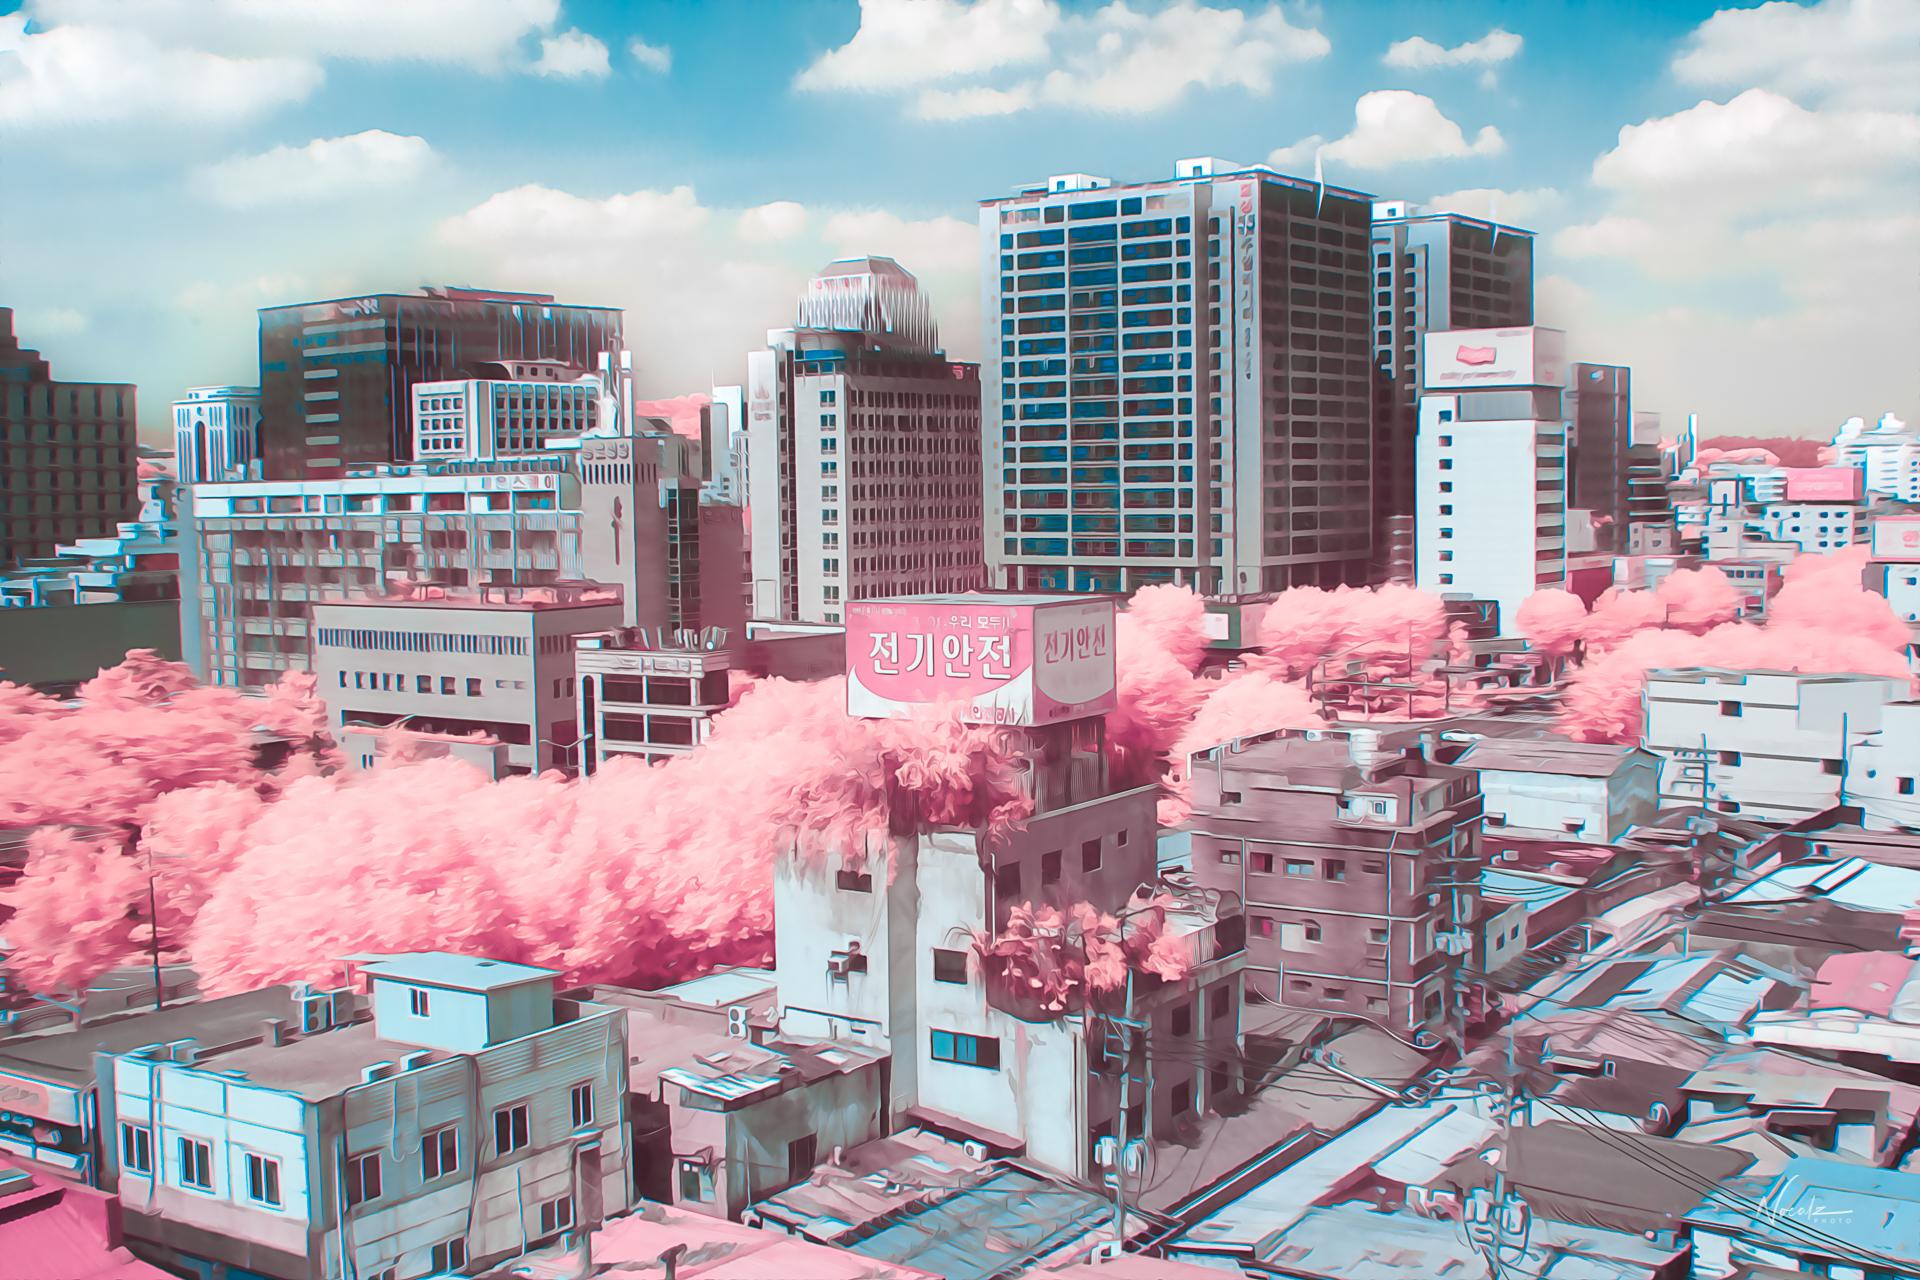 General 1920x1280 watermarked building cherry blossom Korean